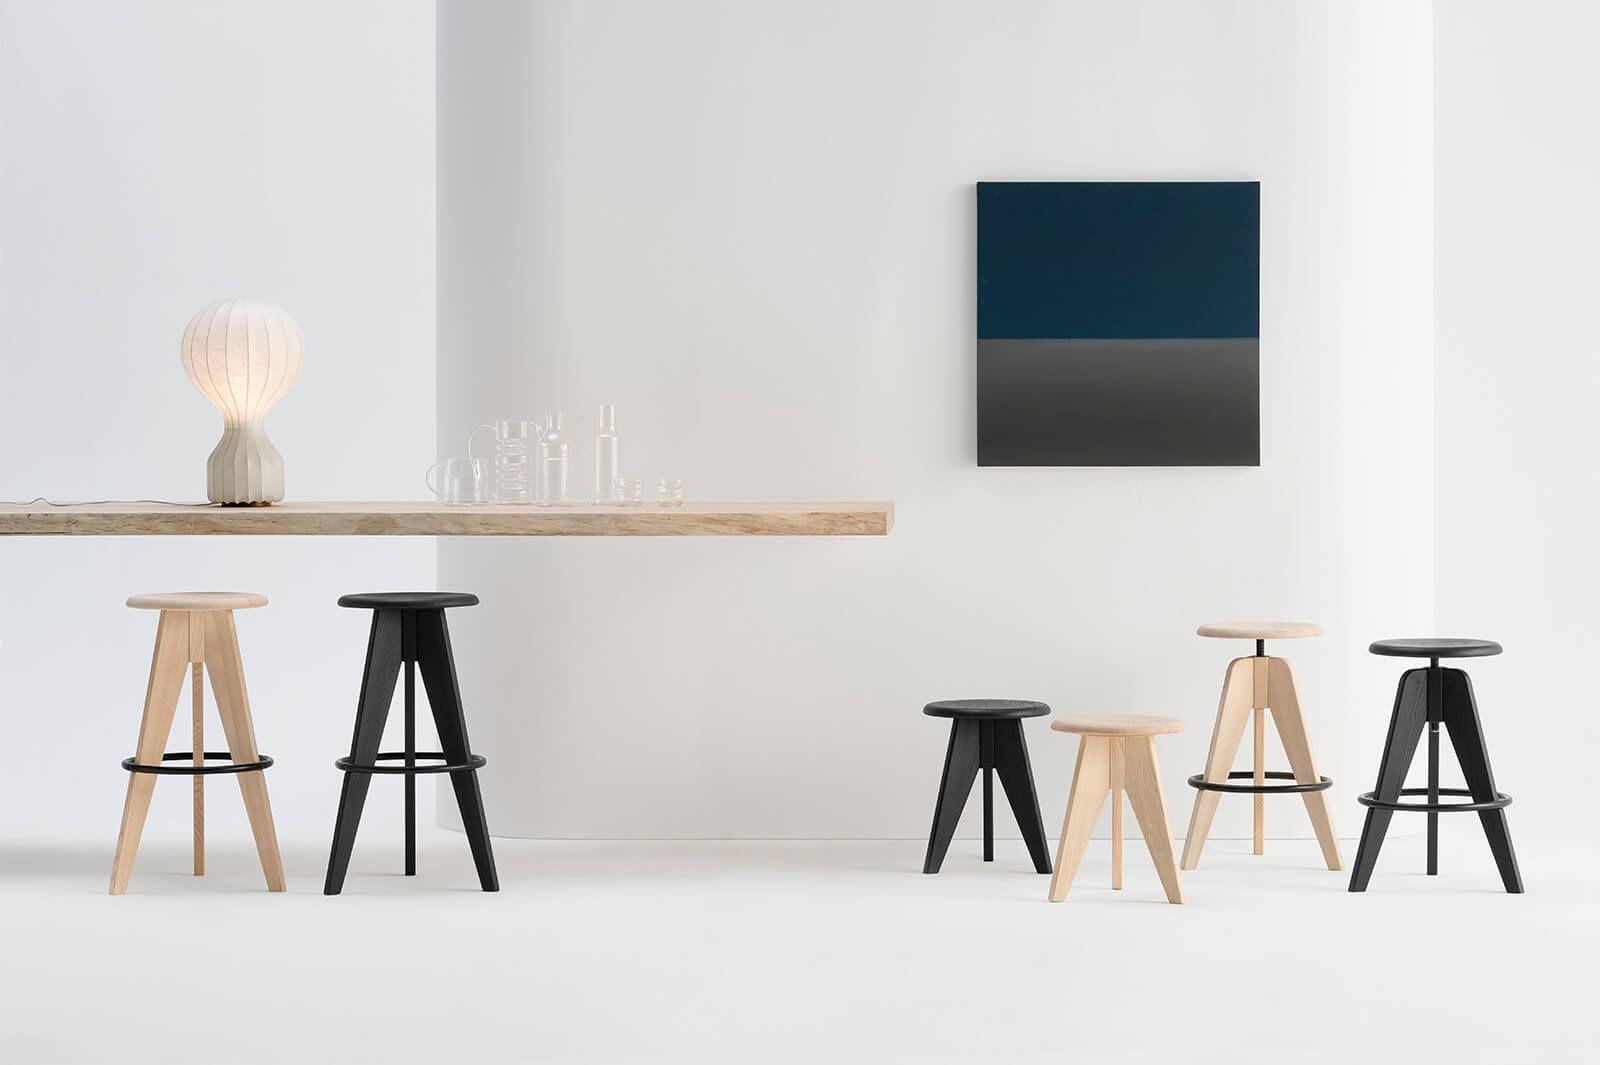 Sipa sedie tommy sgabello product design wood stool wood